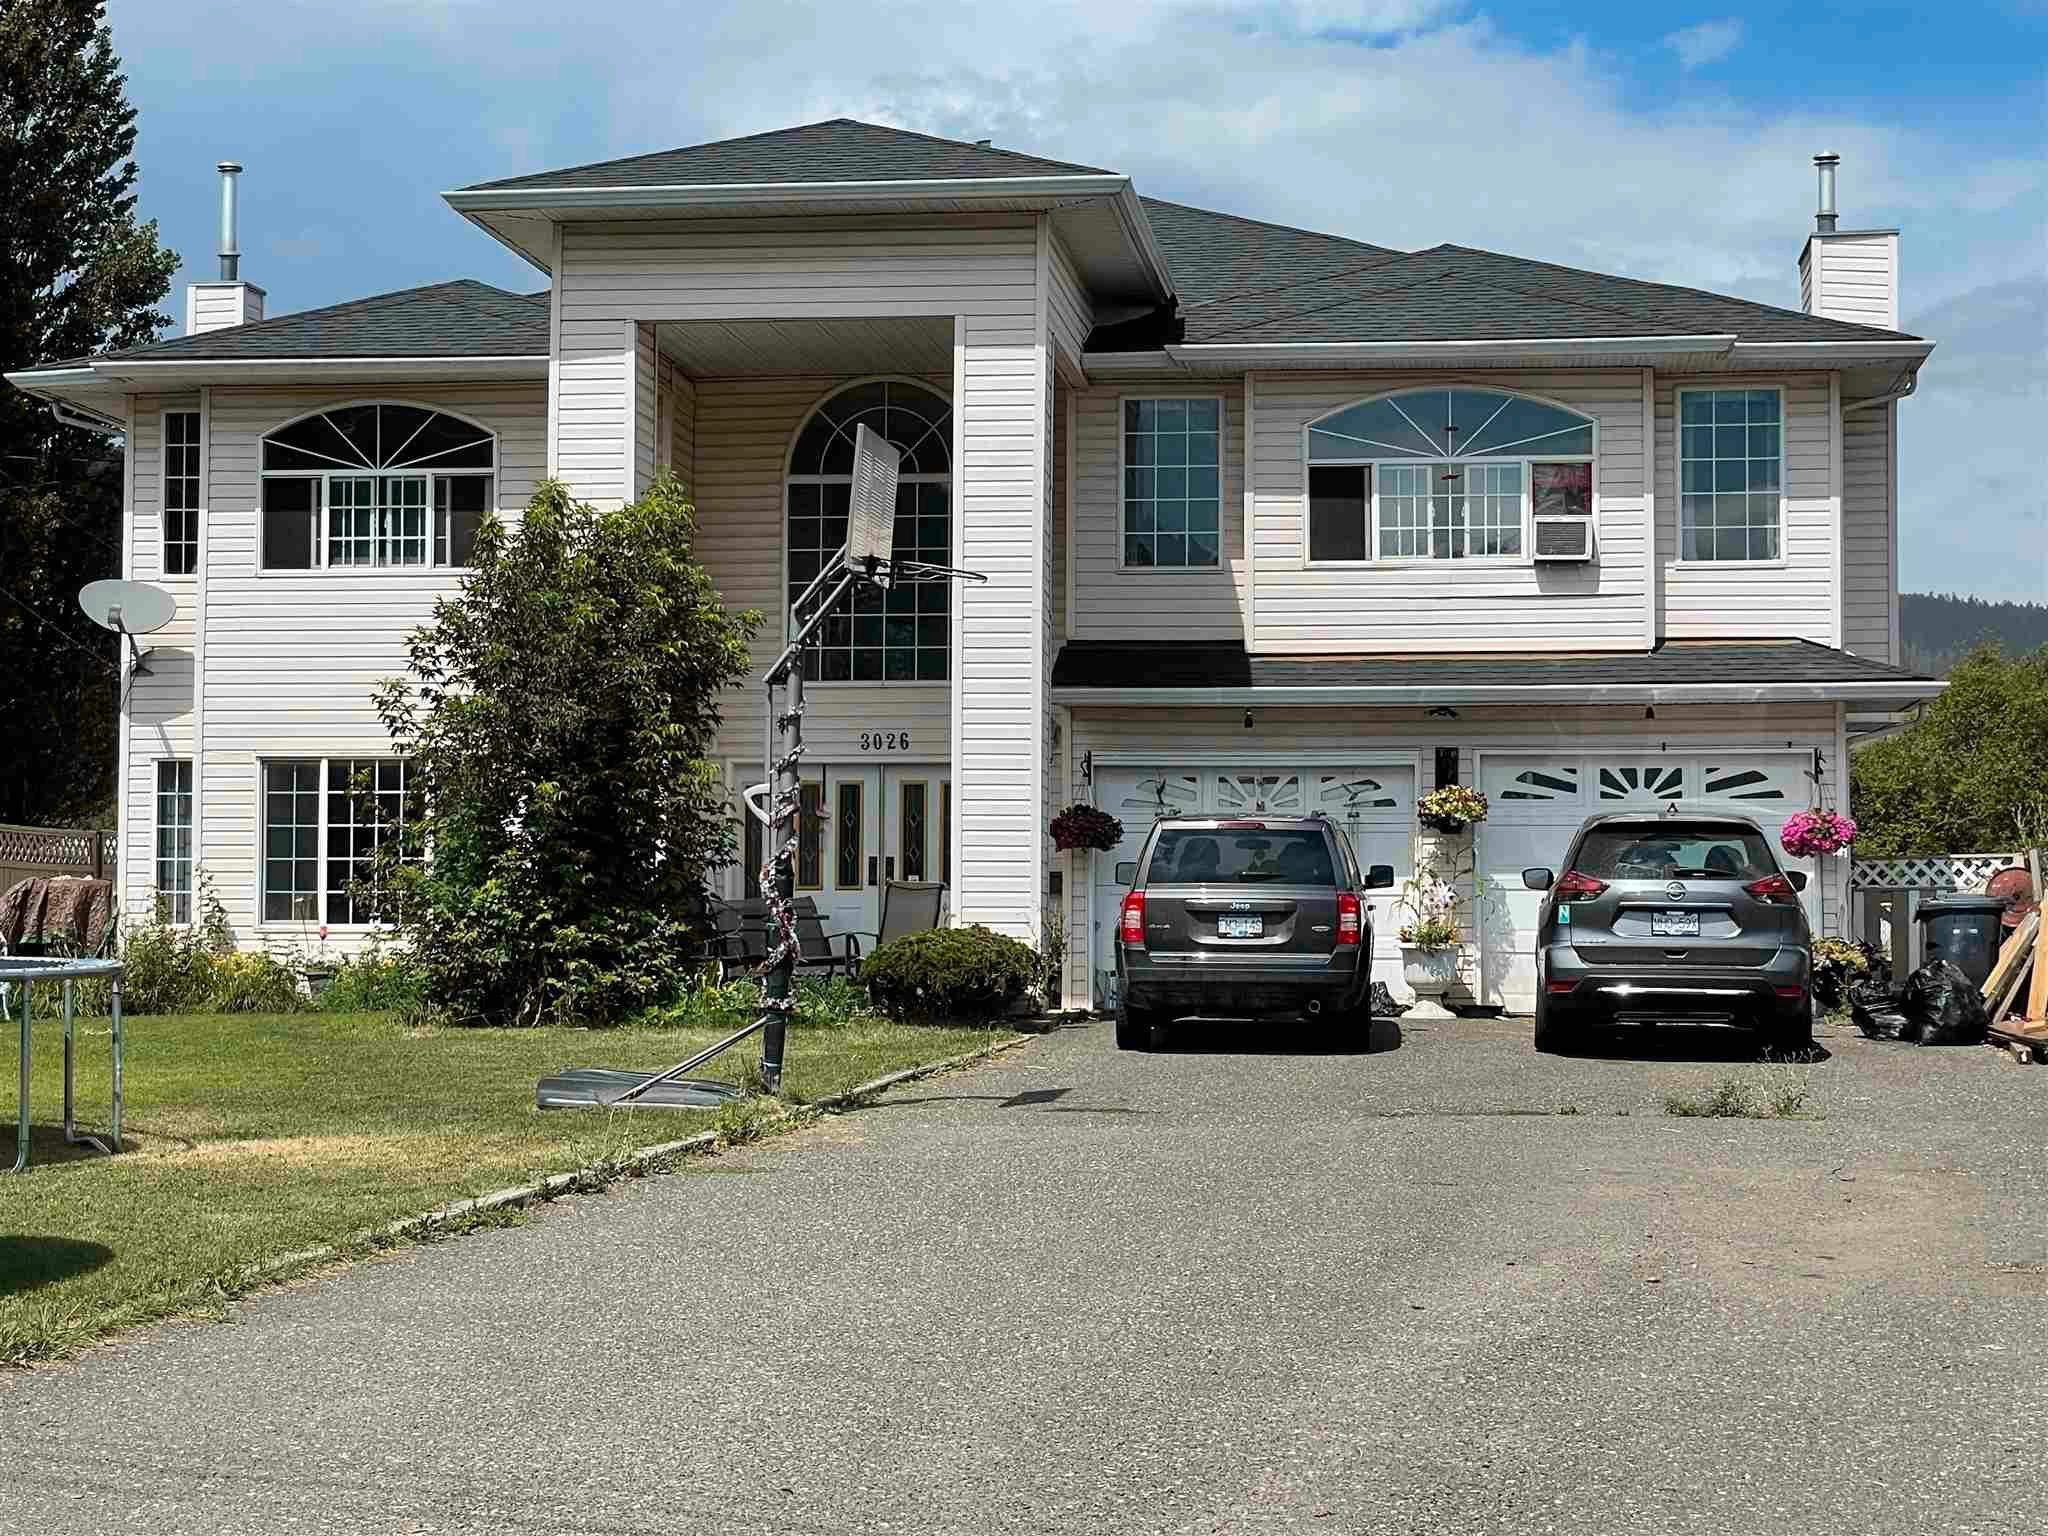 Main Photo: 3026 EDWARDS Drive in Williams Lake: Williams Lake - City House for sale (Williams Lake (Zone 27))  : MLS®# R2604151